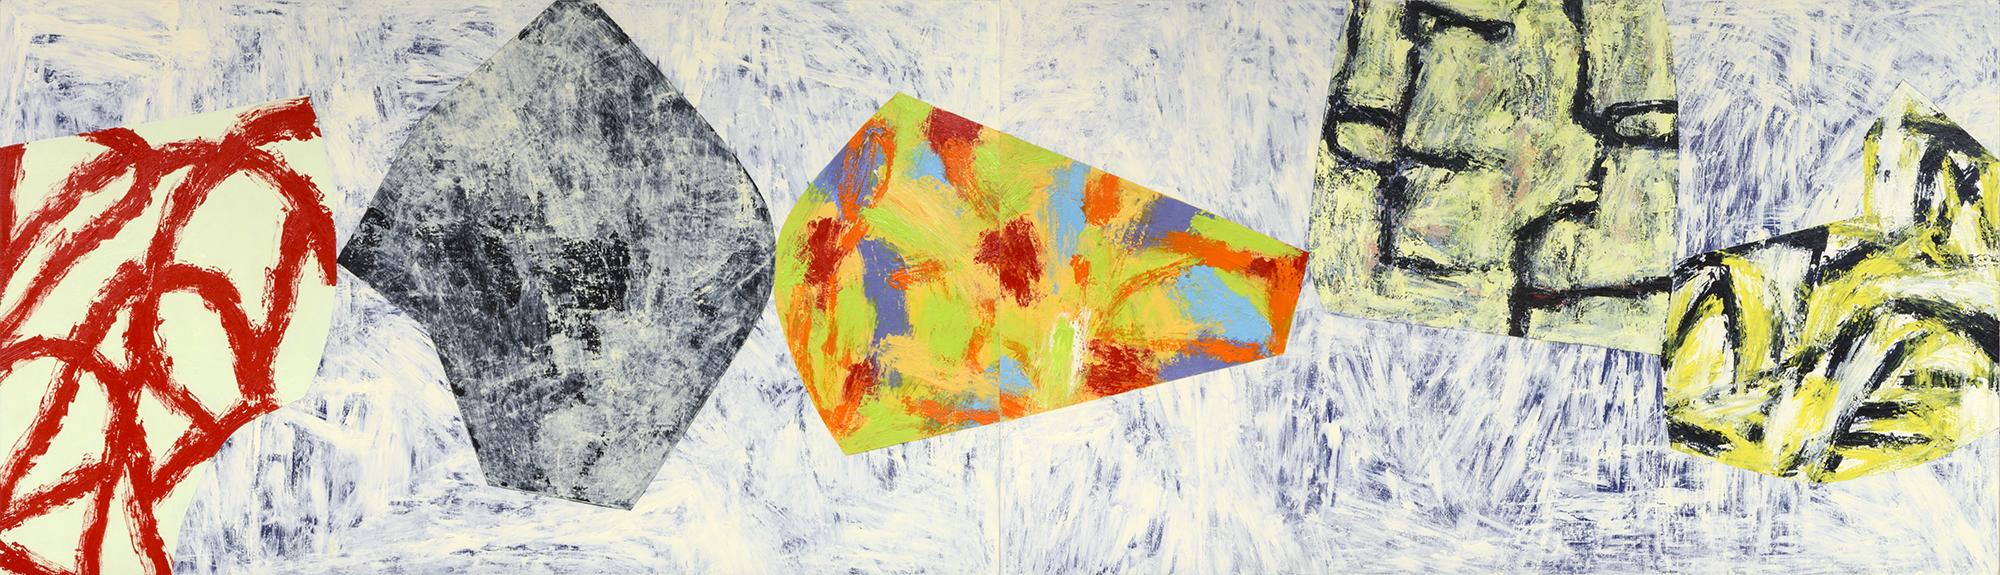 "Modern Dance / 15   Jerrold Burchman  BU286  Acrylic on Wood Panel  24"" x 84"""